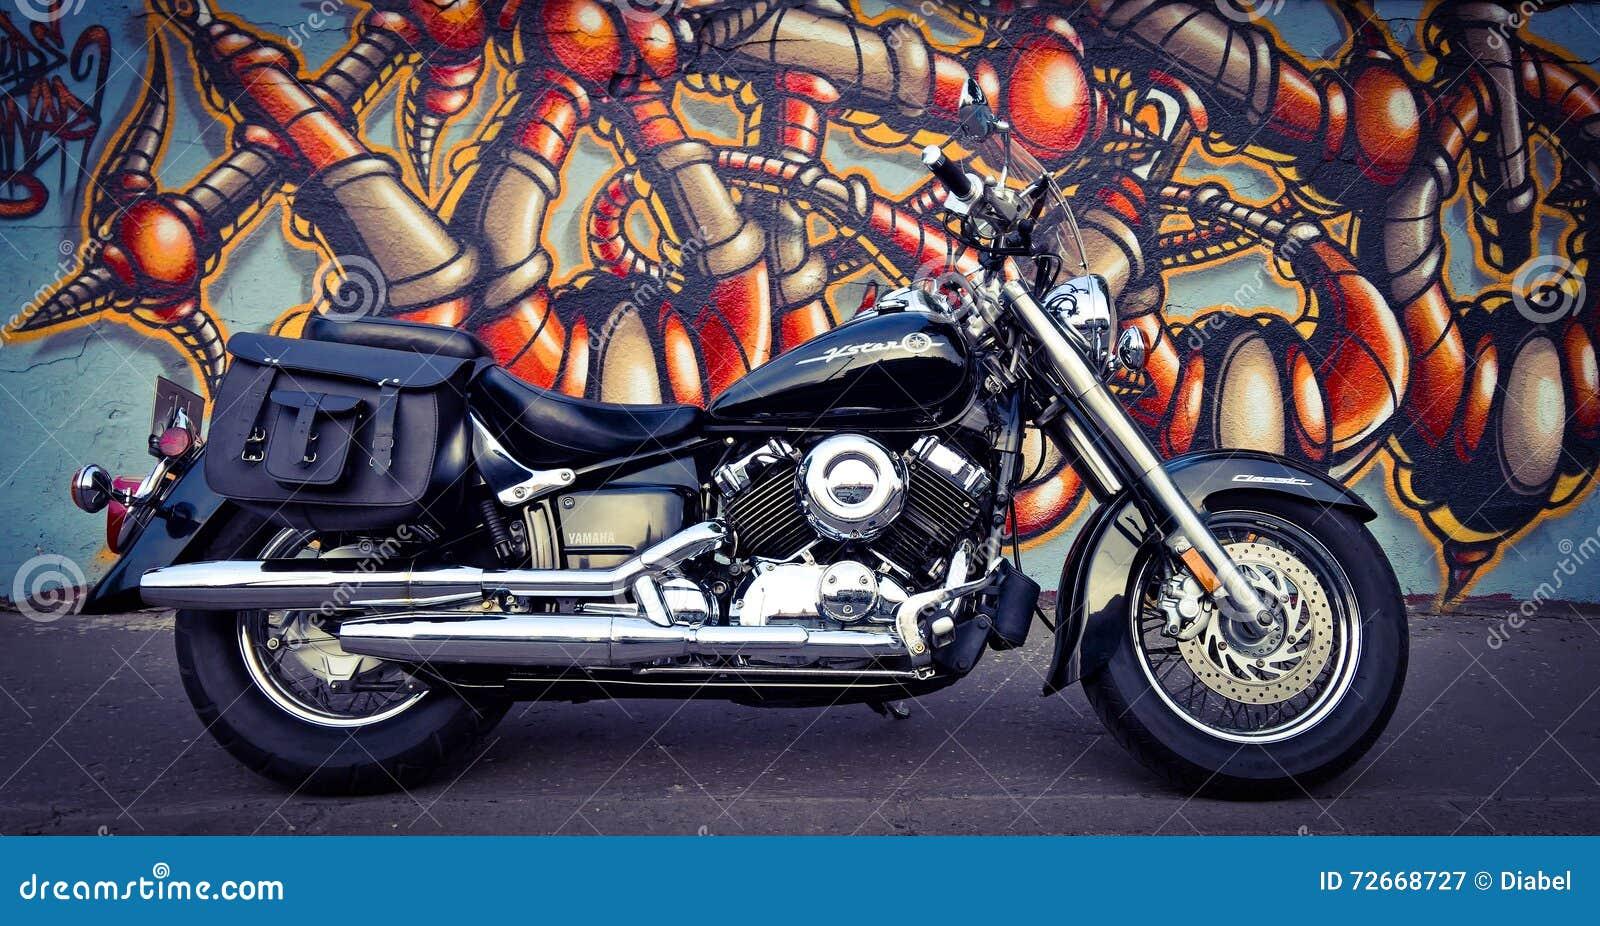 Graffiti wall black - Black City Cracow Graffiti Motorcycle Wall